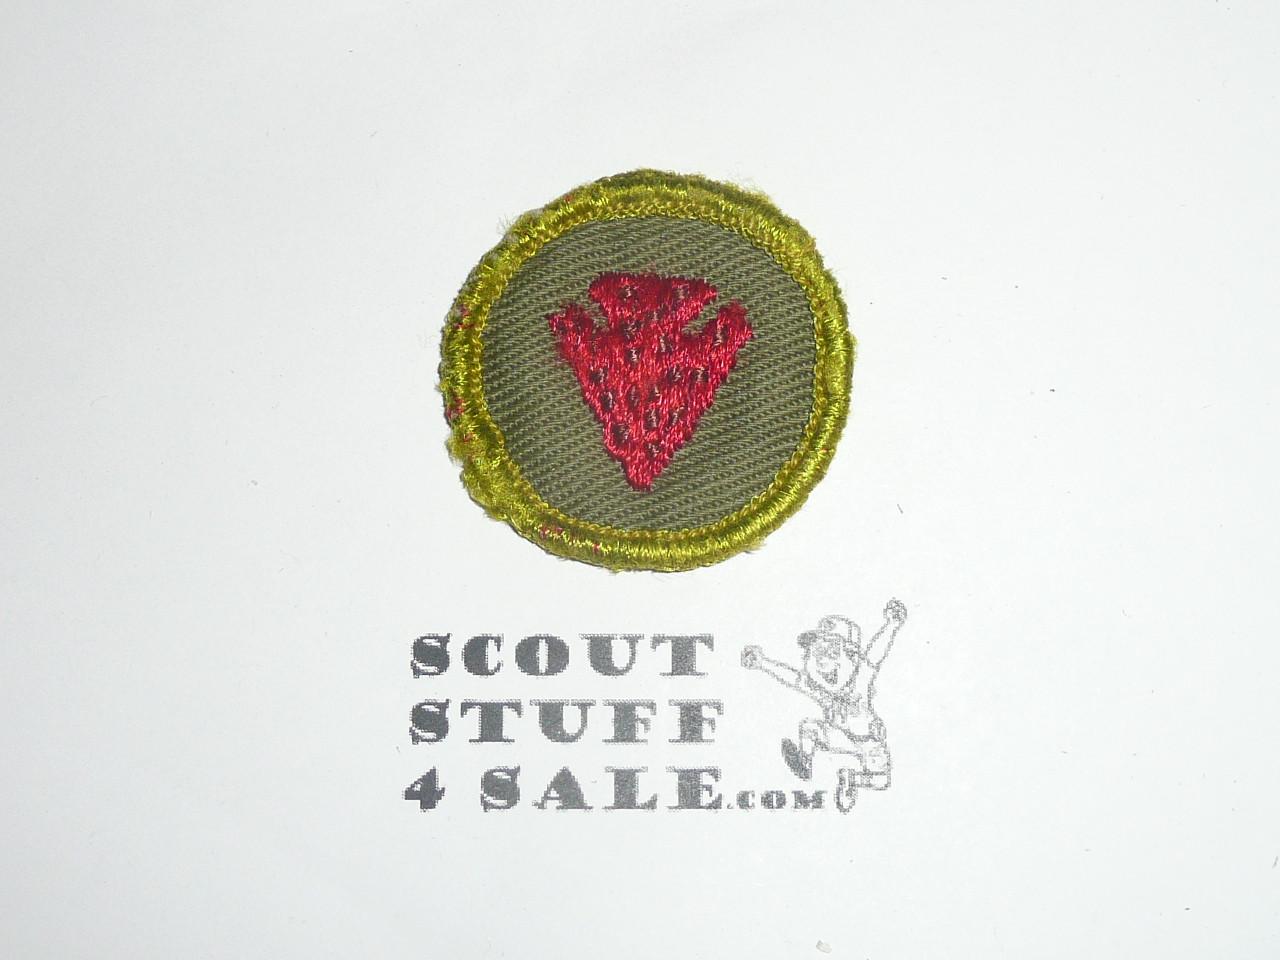 Indian Lore - Type F - Rolled Edge Twill Merit Badge (1961-1968), sewn